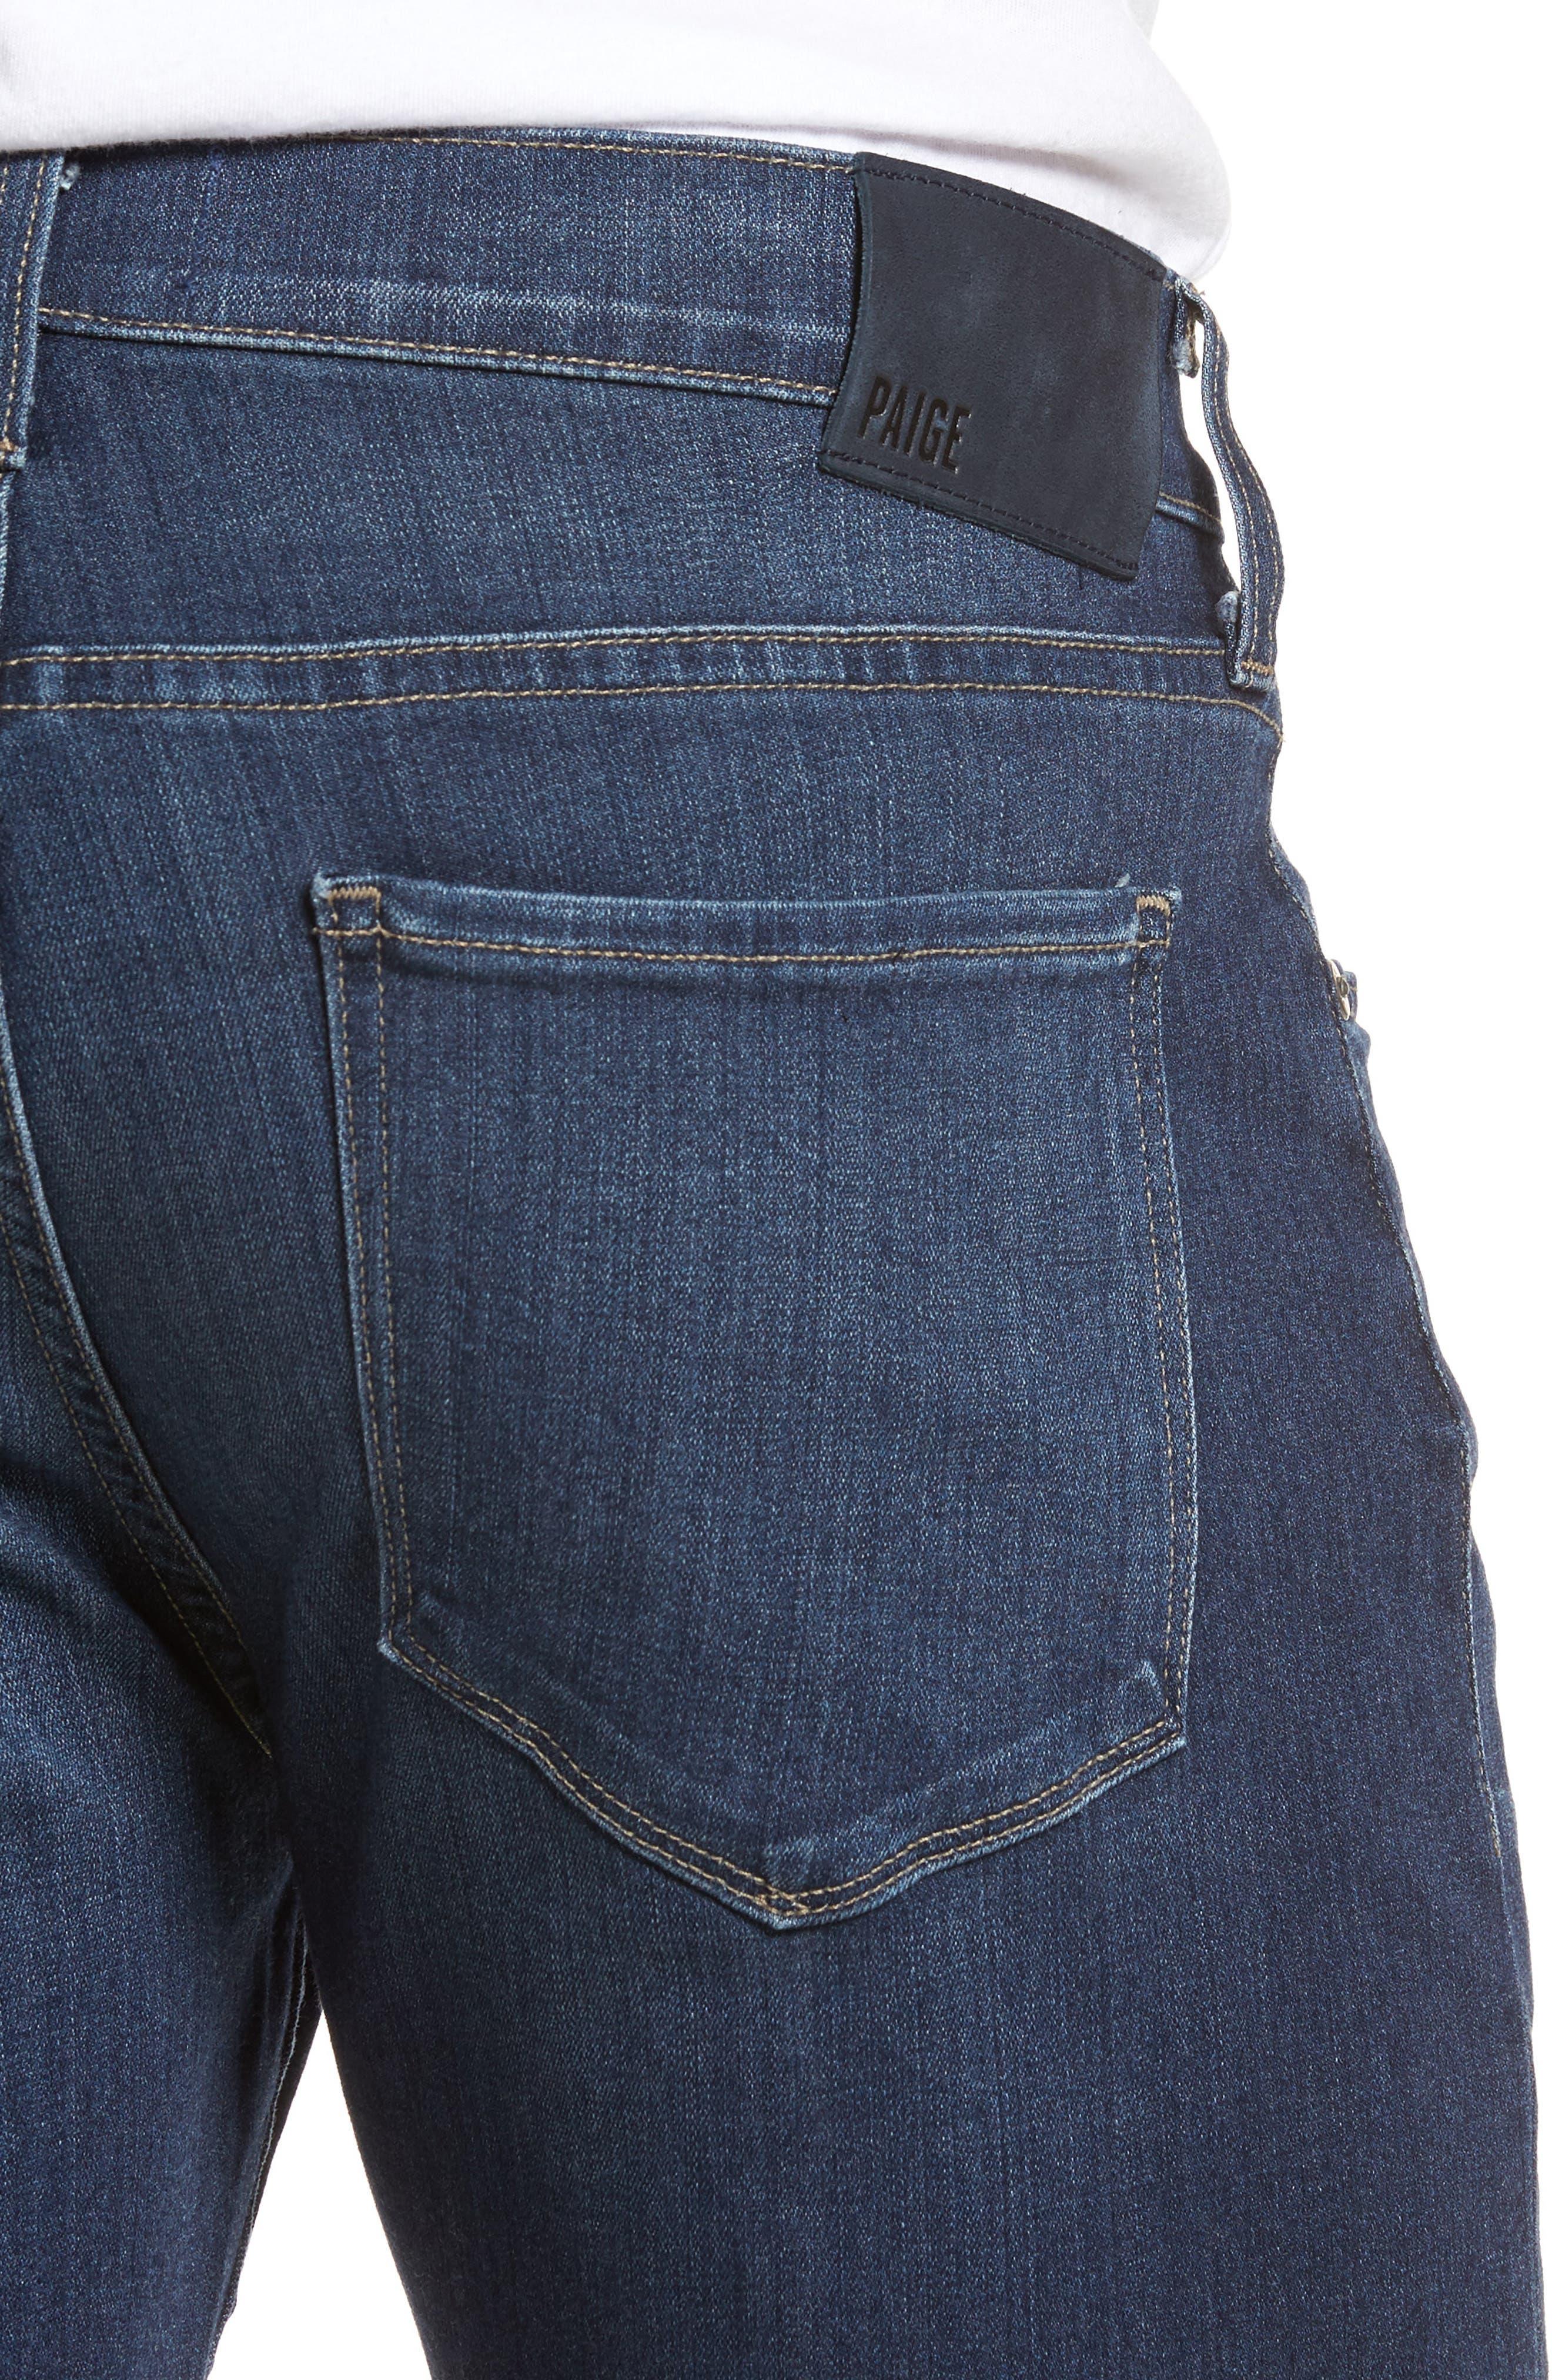 Transcend - Federal Slim Straight Leg Denim Shorts,                             Alternate thumbnail 4, color,                             Leo